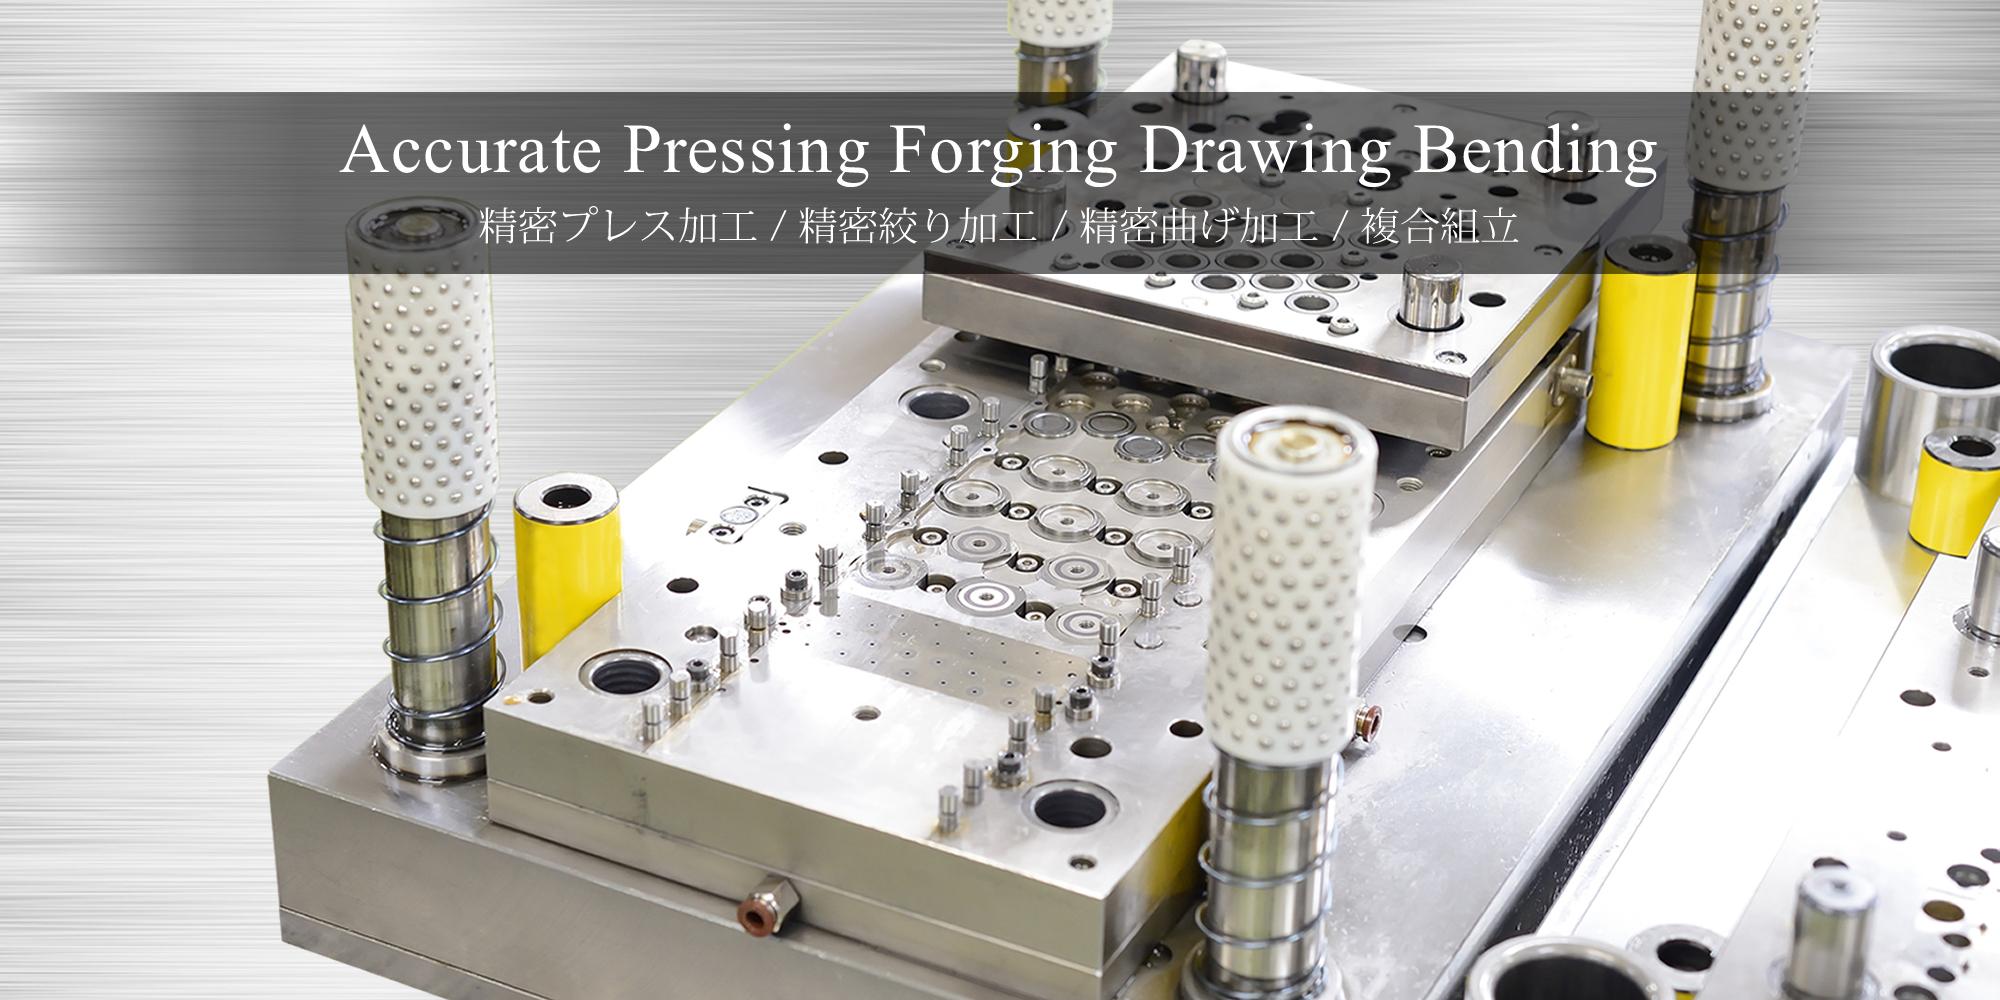 Accurate Pressing Forging Drawing Bending 精密プレス加工 / 精密鍛造加工 / 精密絞り加工 / 精密曲げ加工 / 複合組立